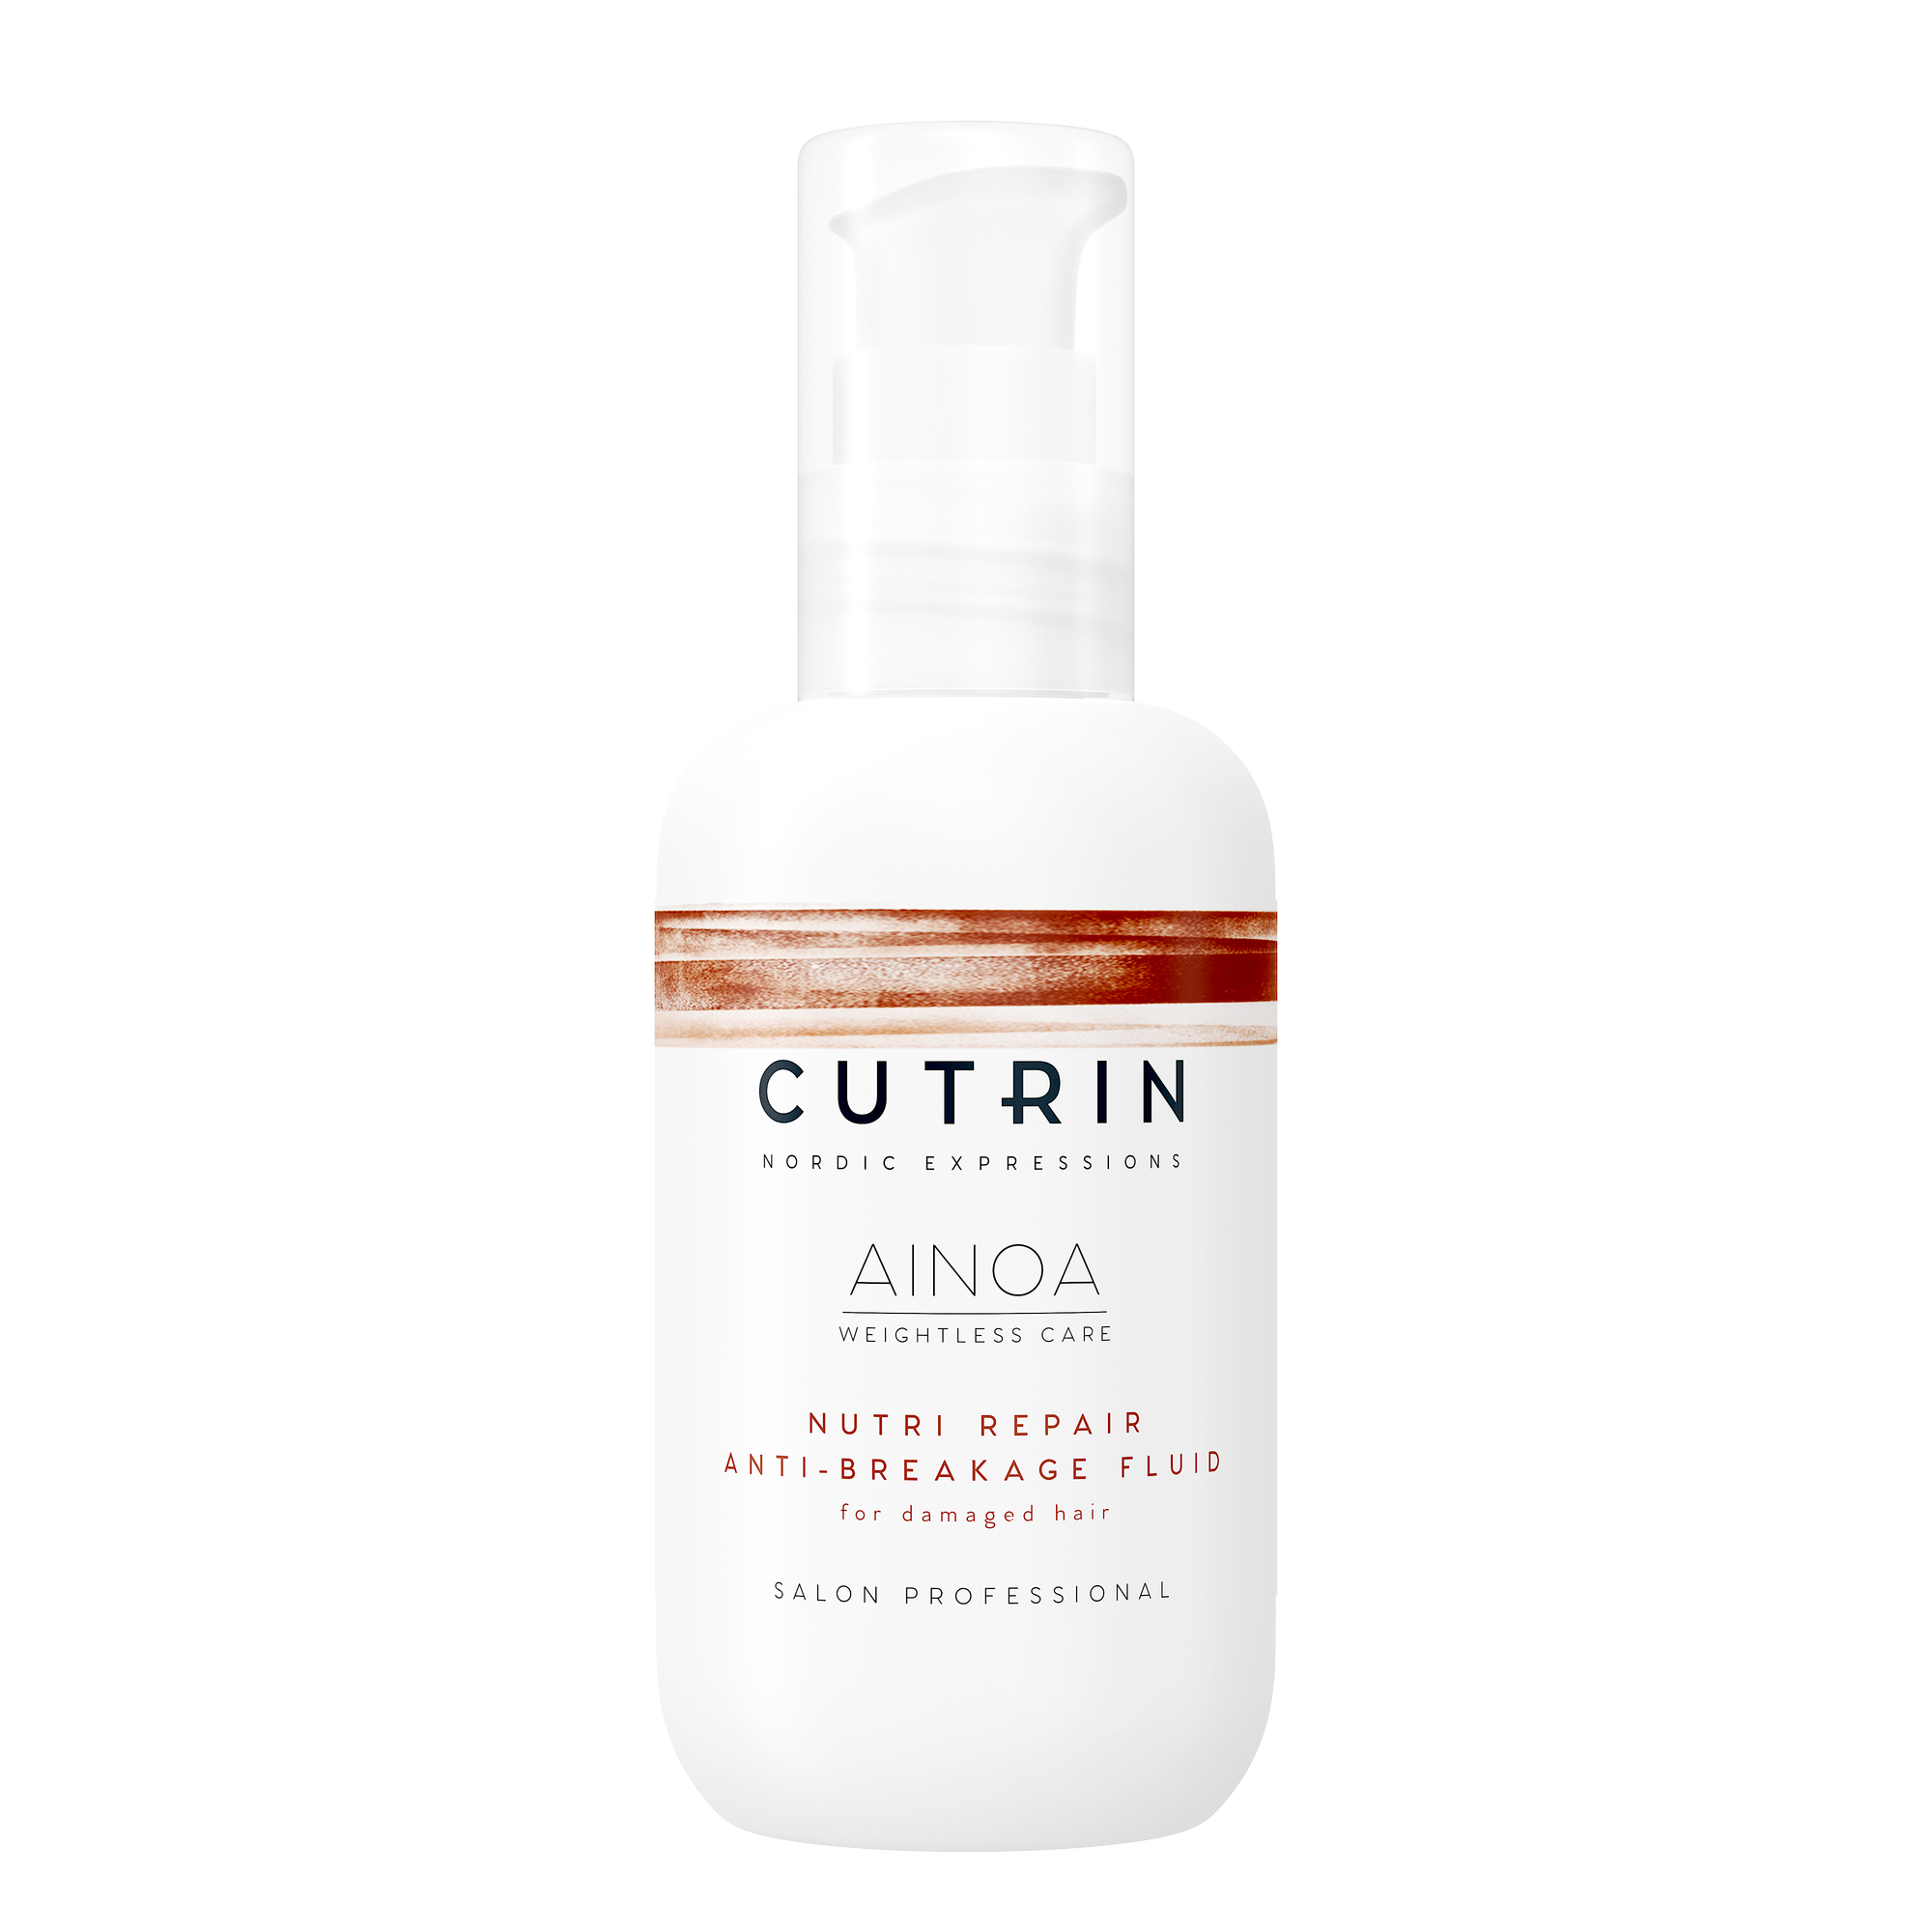 CUTRIN Флюид несмываемый для восстановления волос / AINOA NUTRI REPAIR 150 мл.